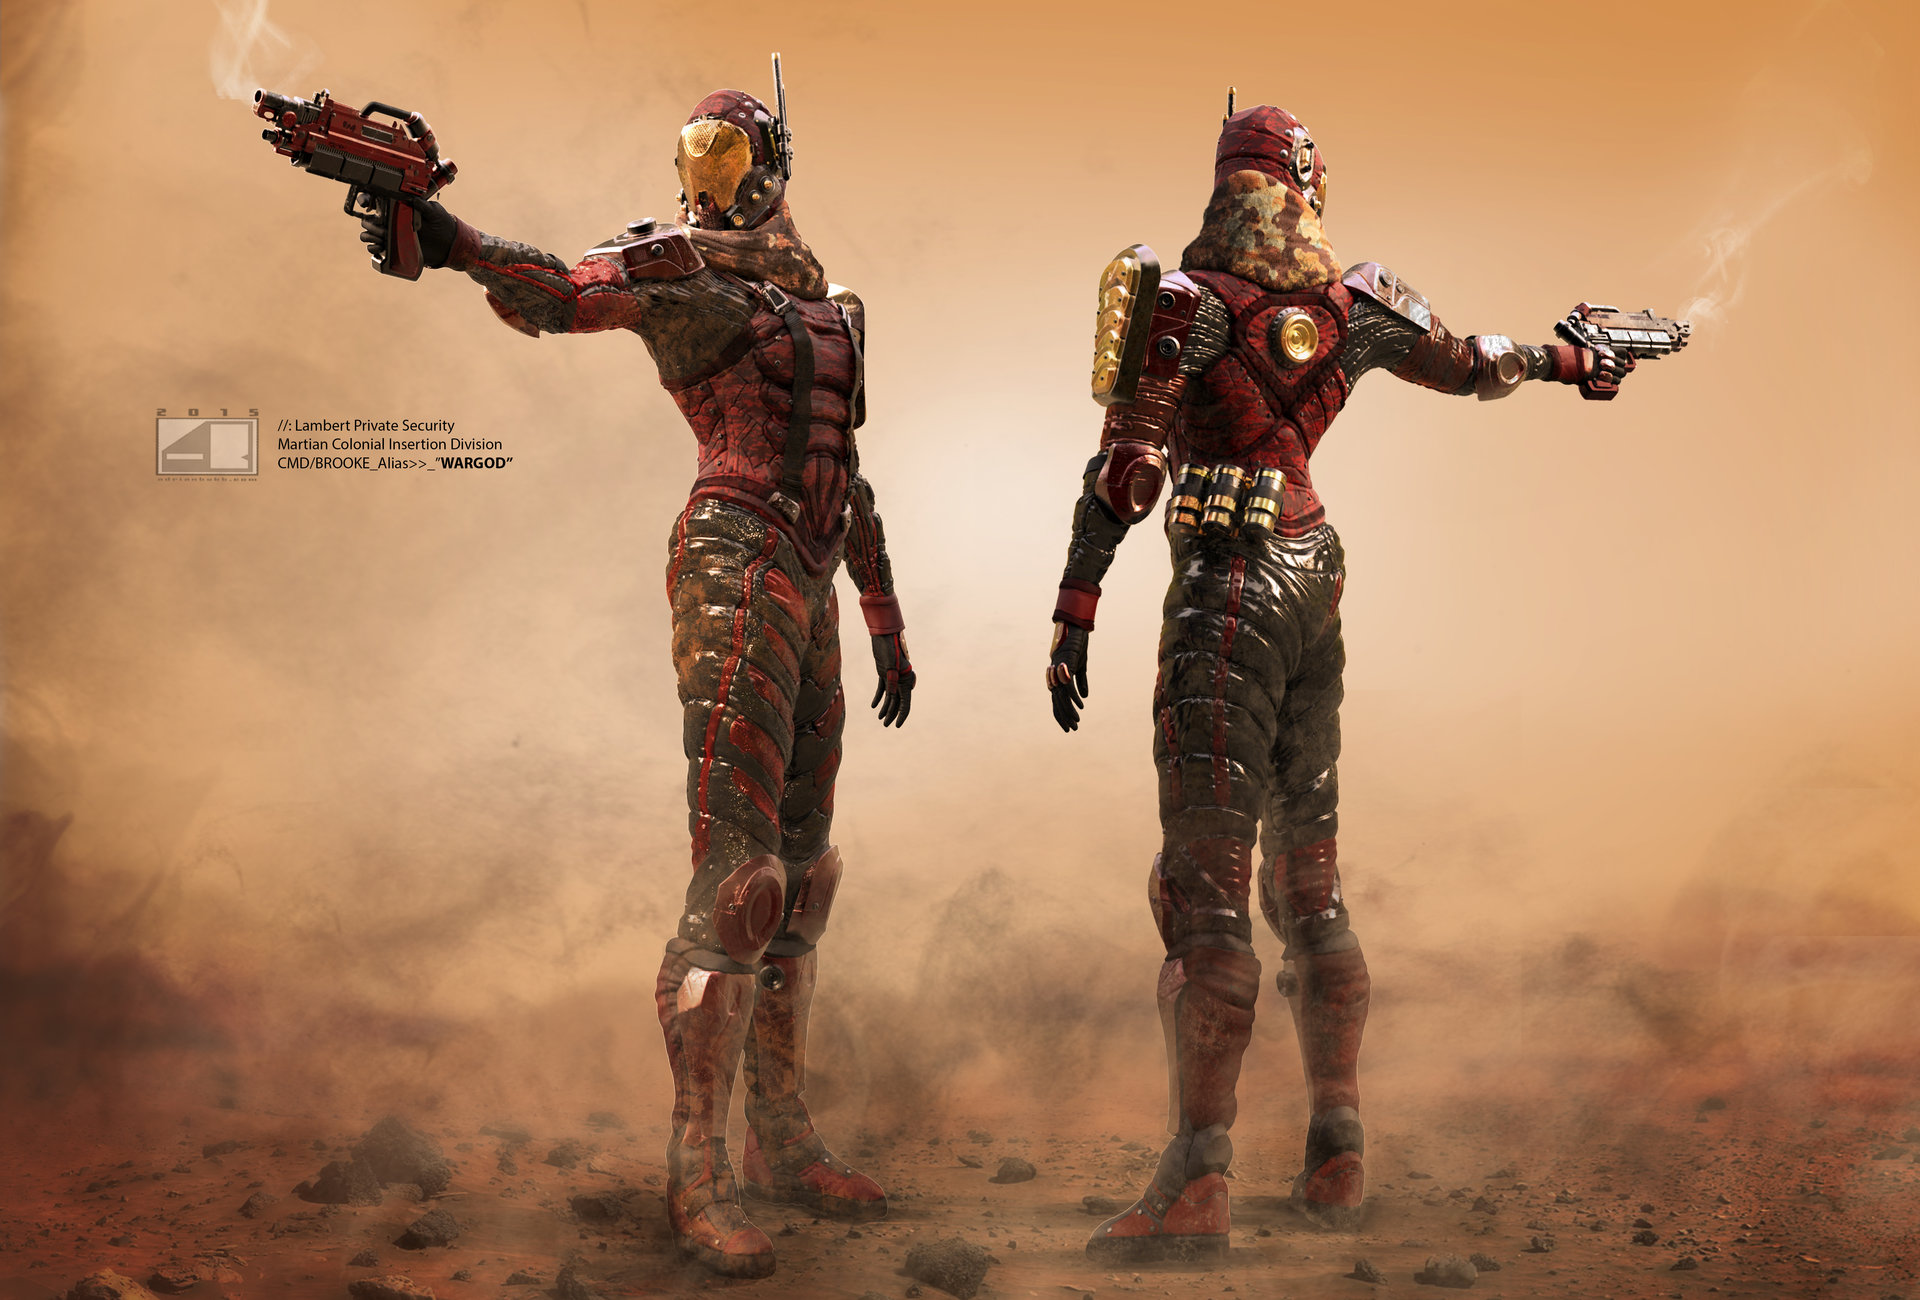 Martian CID Commander (Full Body Color and Texture Render)